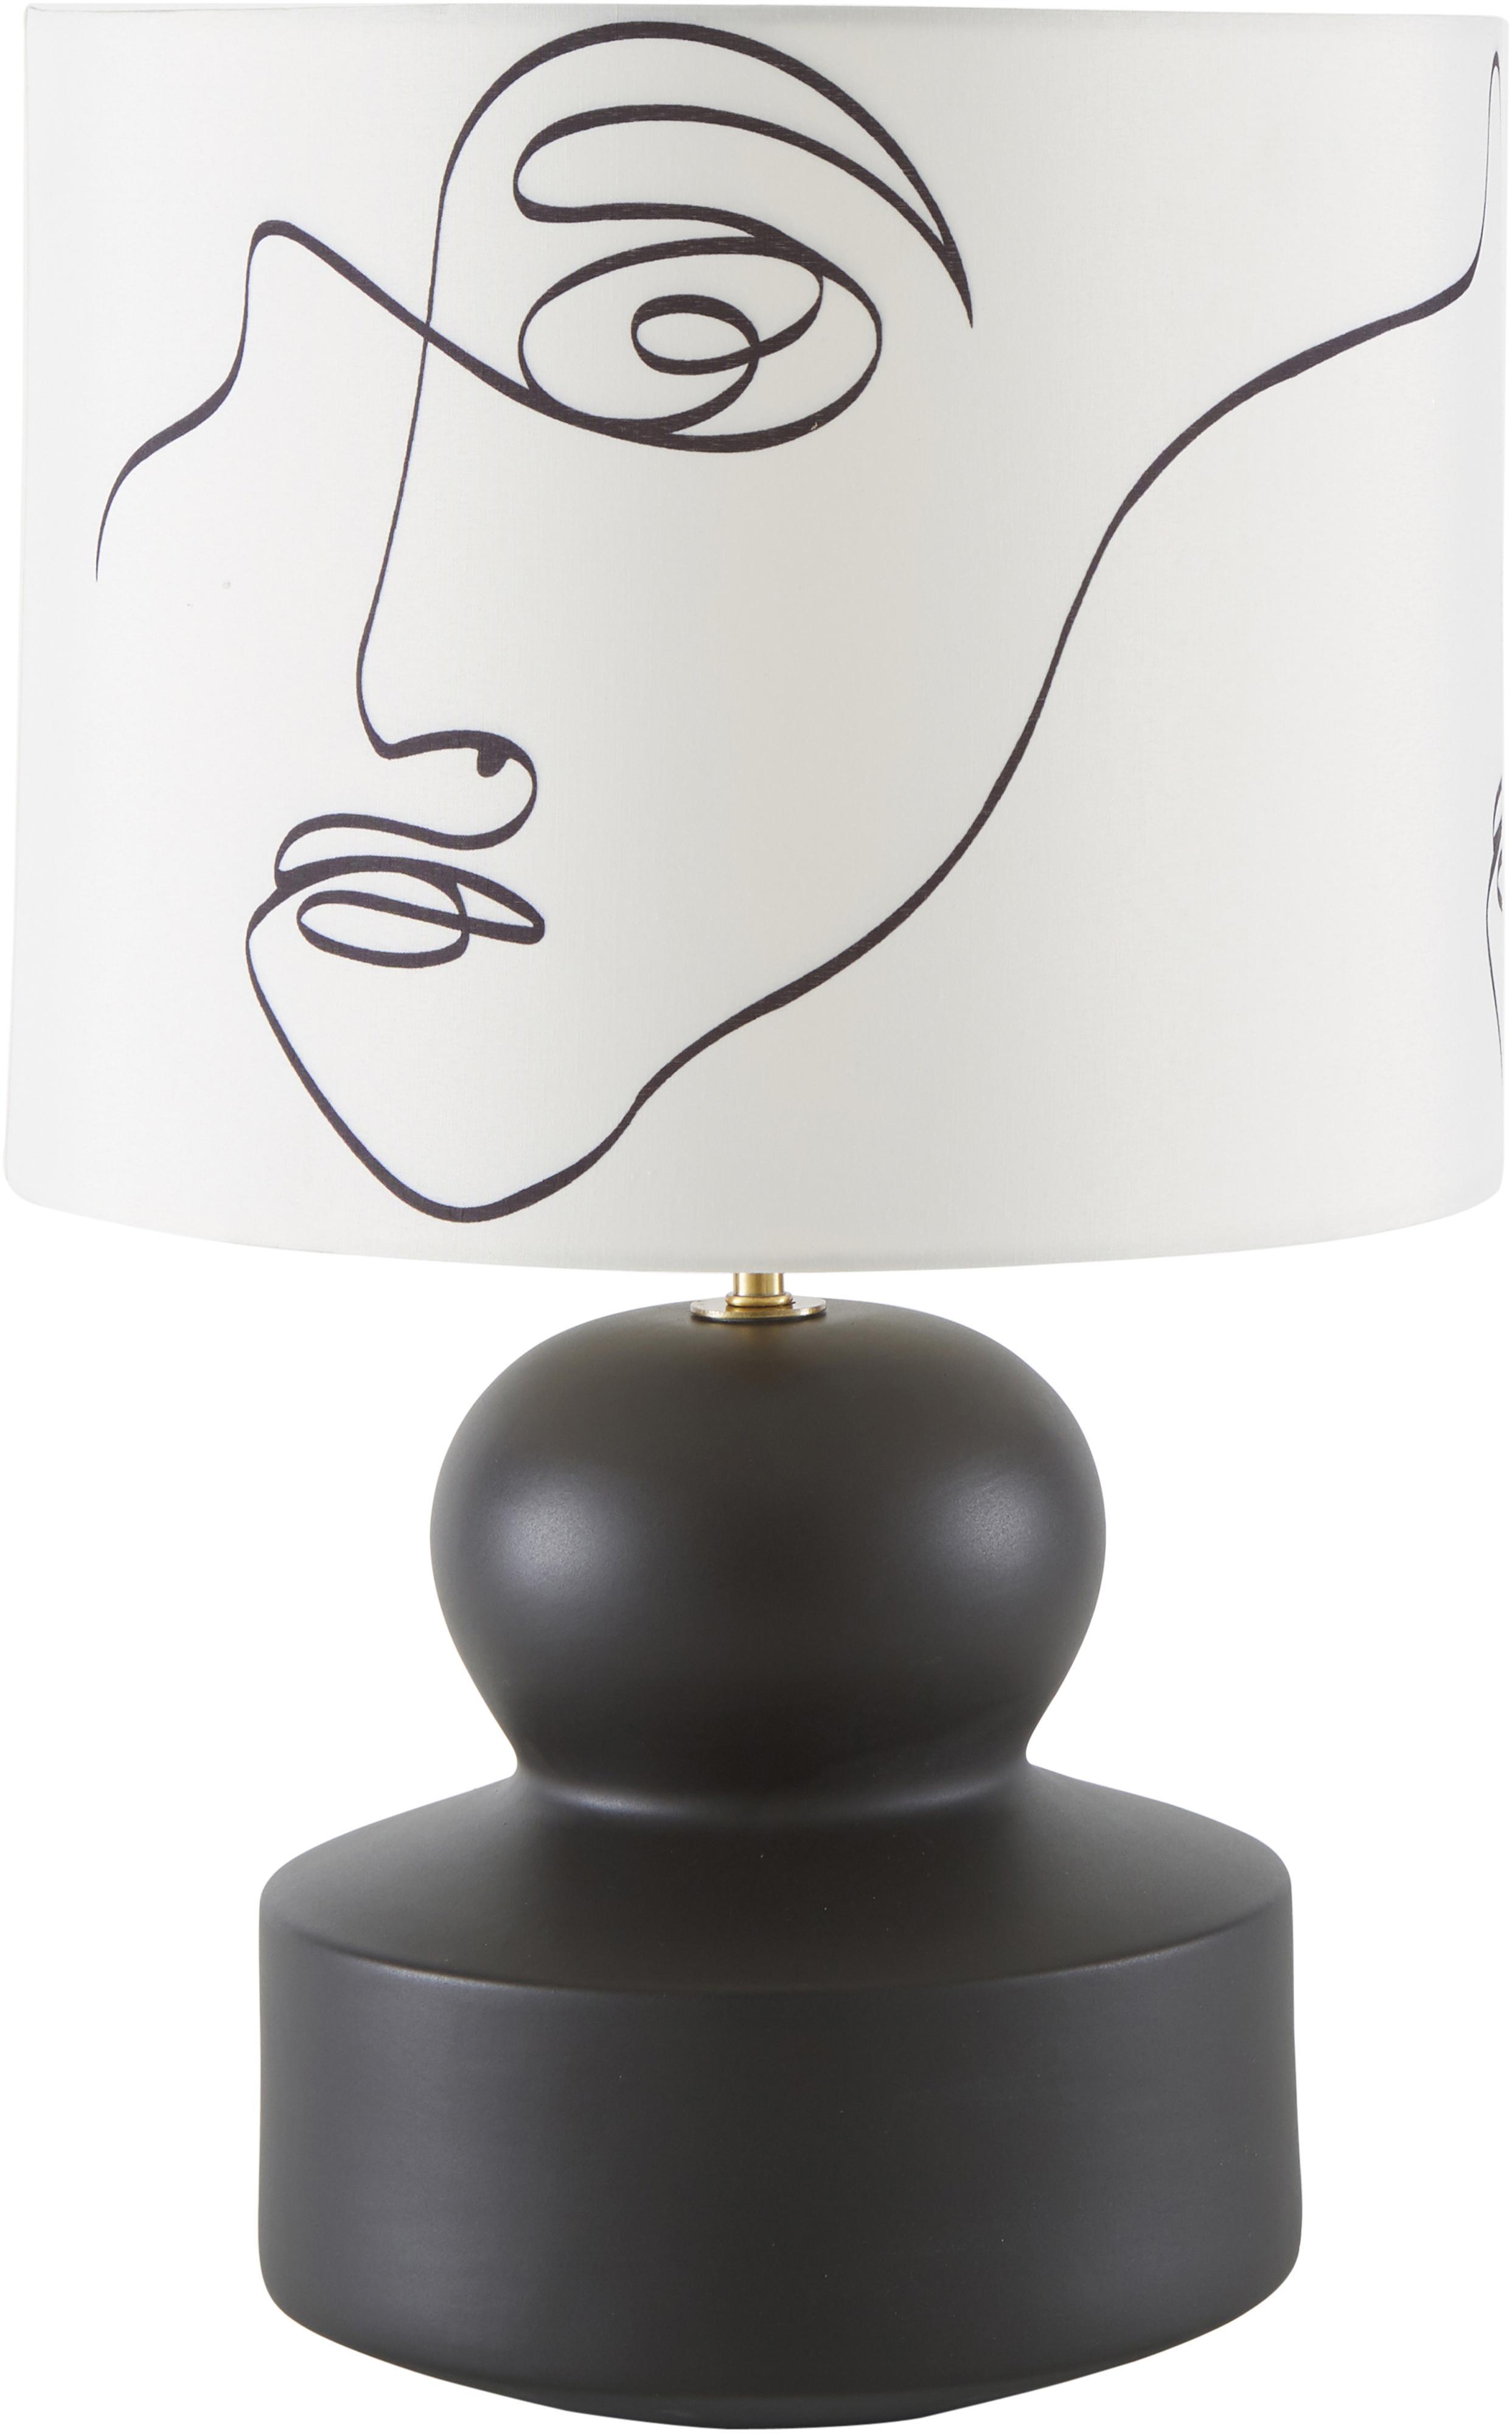 Keramische tafellamp Georgina, Lampenkap: textiel, Lampvoet: keramiek, Decoratie: vermessingd metaal, Crèmewit, zwart, Ø 33 x H 52 cm